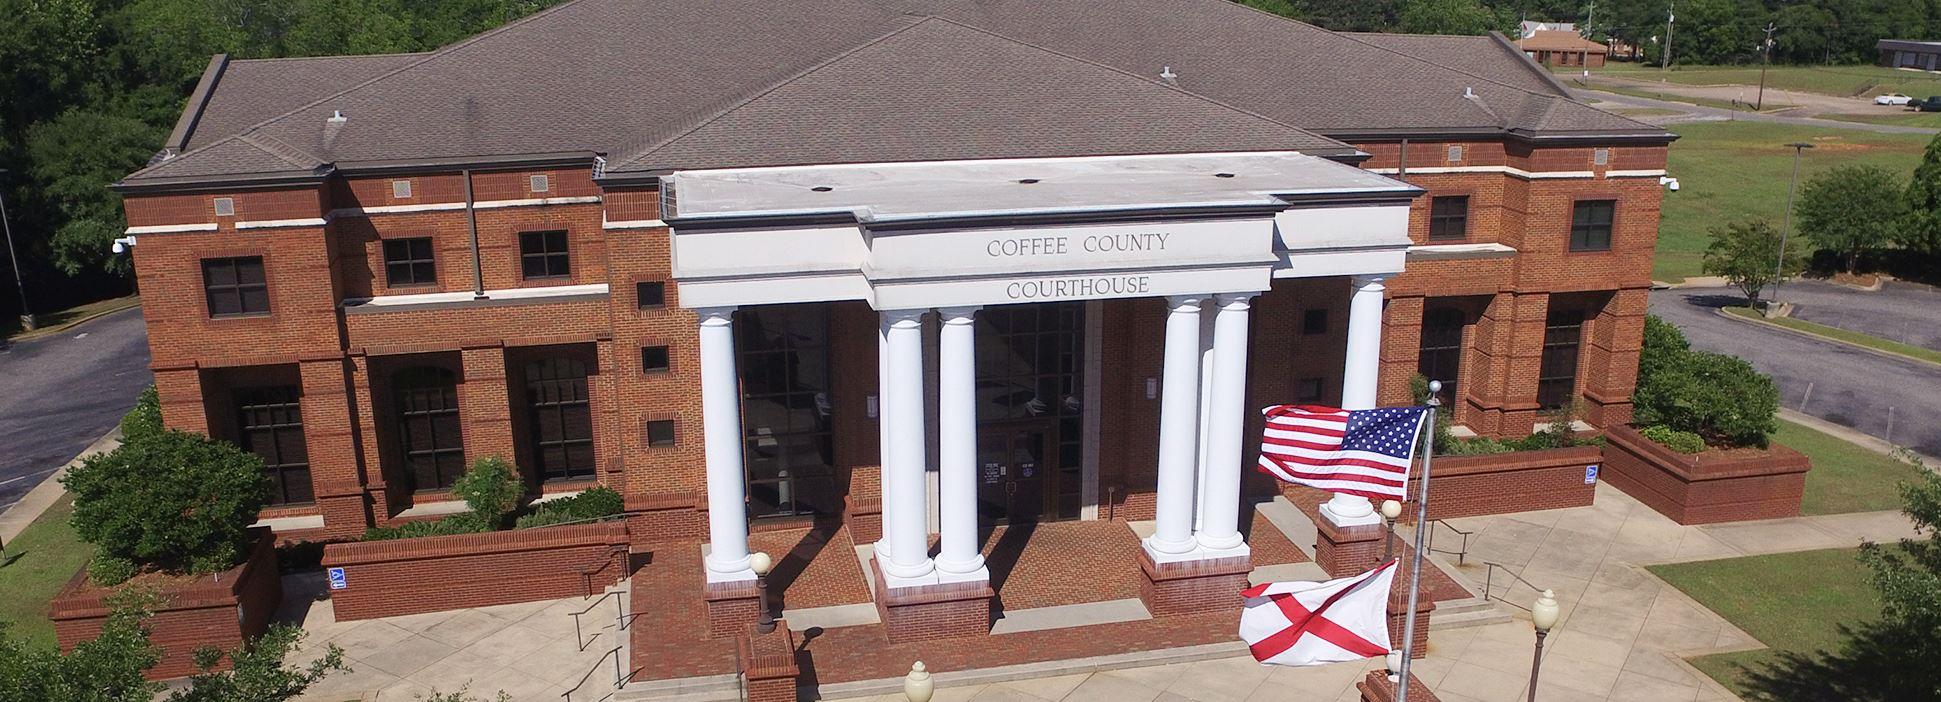 Coffee County Al Official Website